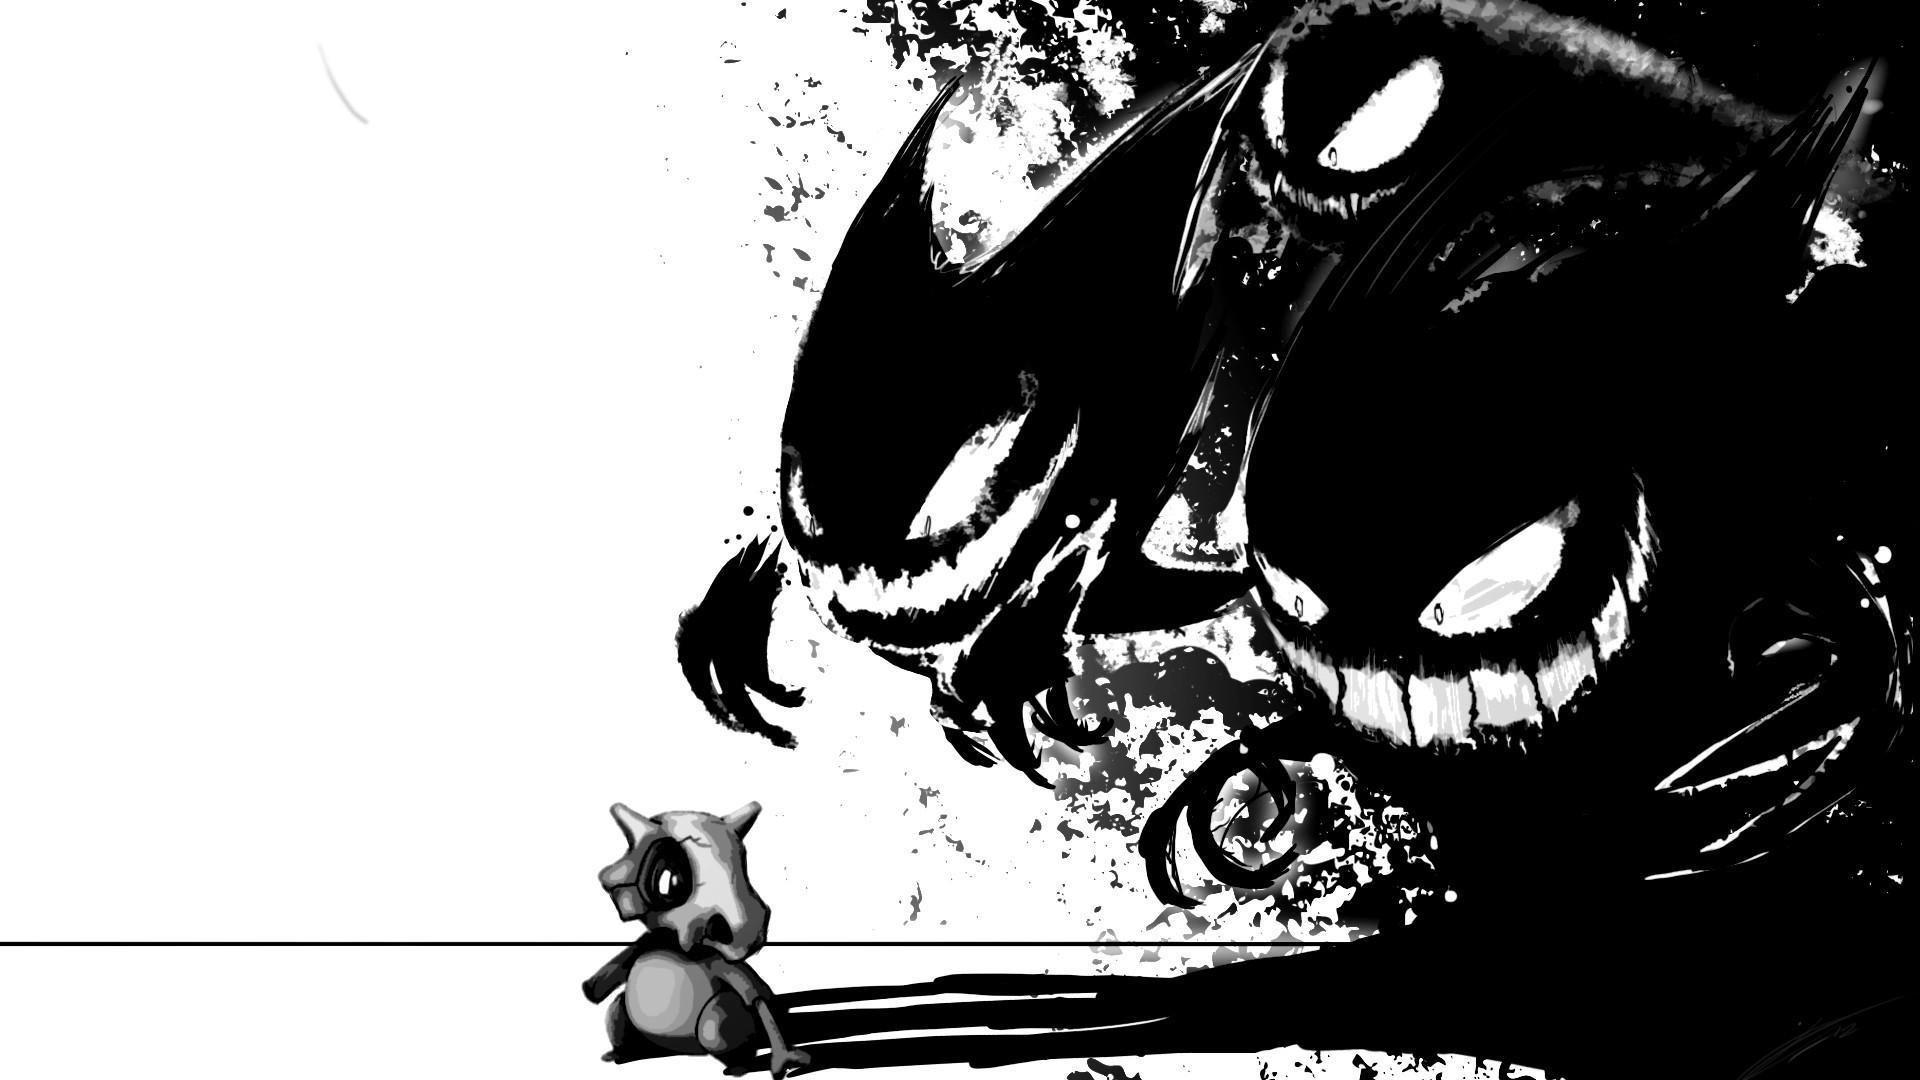 Mega Pack De Wallpapers Full Hd Para Pc Imagenes En Taringa Ghost Pokemon Anime Wallpaper Black Pokemon Descargar pack de imagenes full hd 1080p